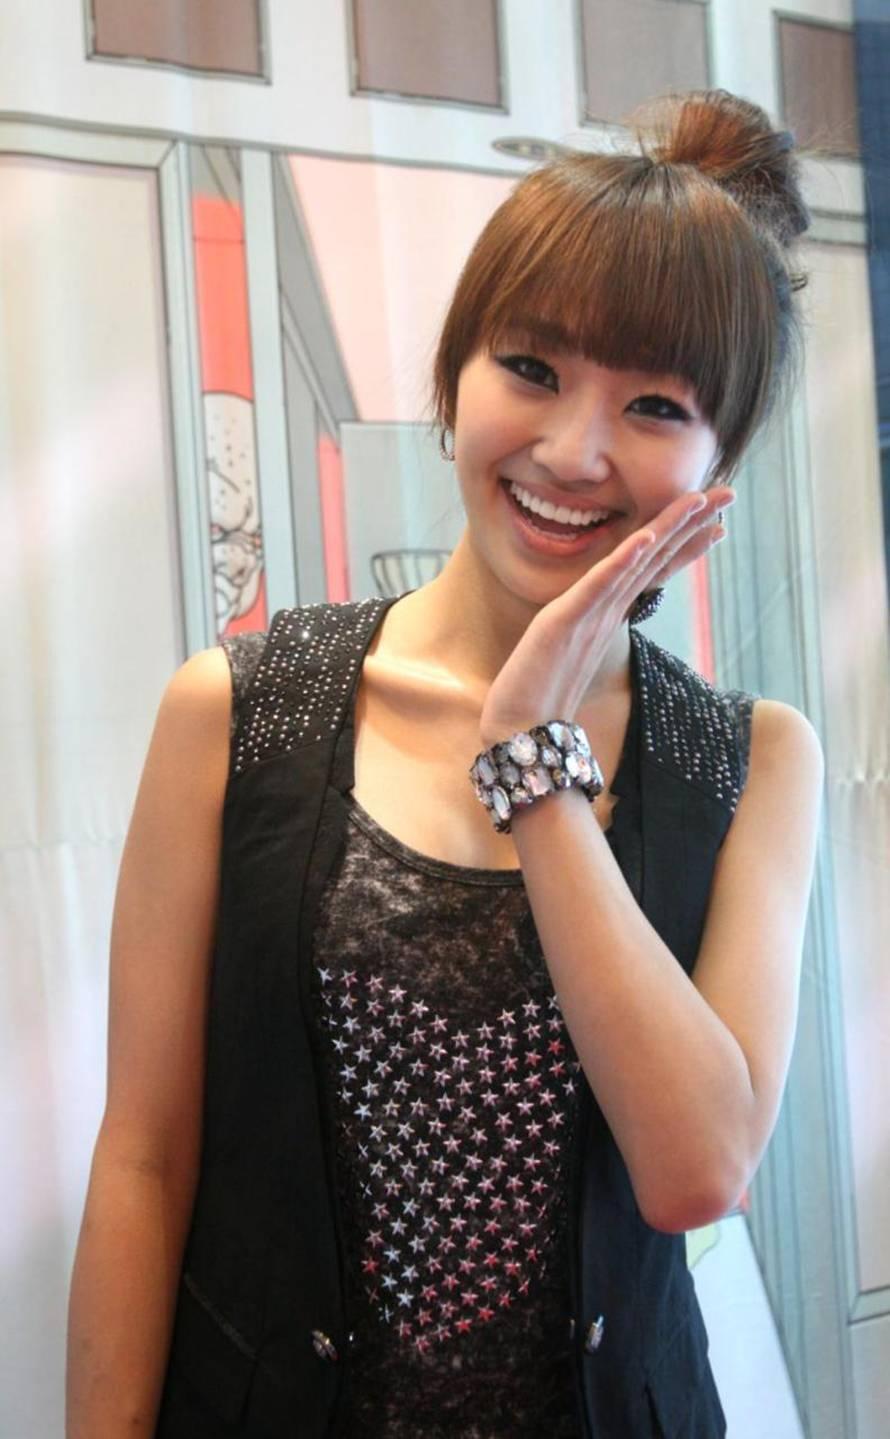 Korean Hairstyles - Hyorin ( SISTAR ) Korean Hairstyles ... Hyorin Sistar